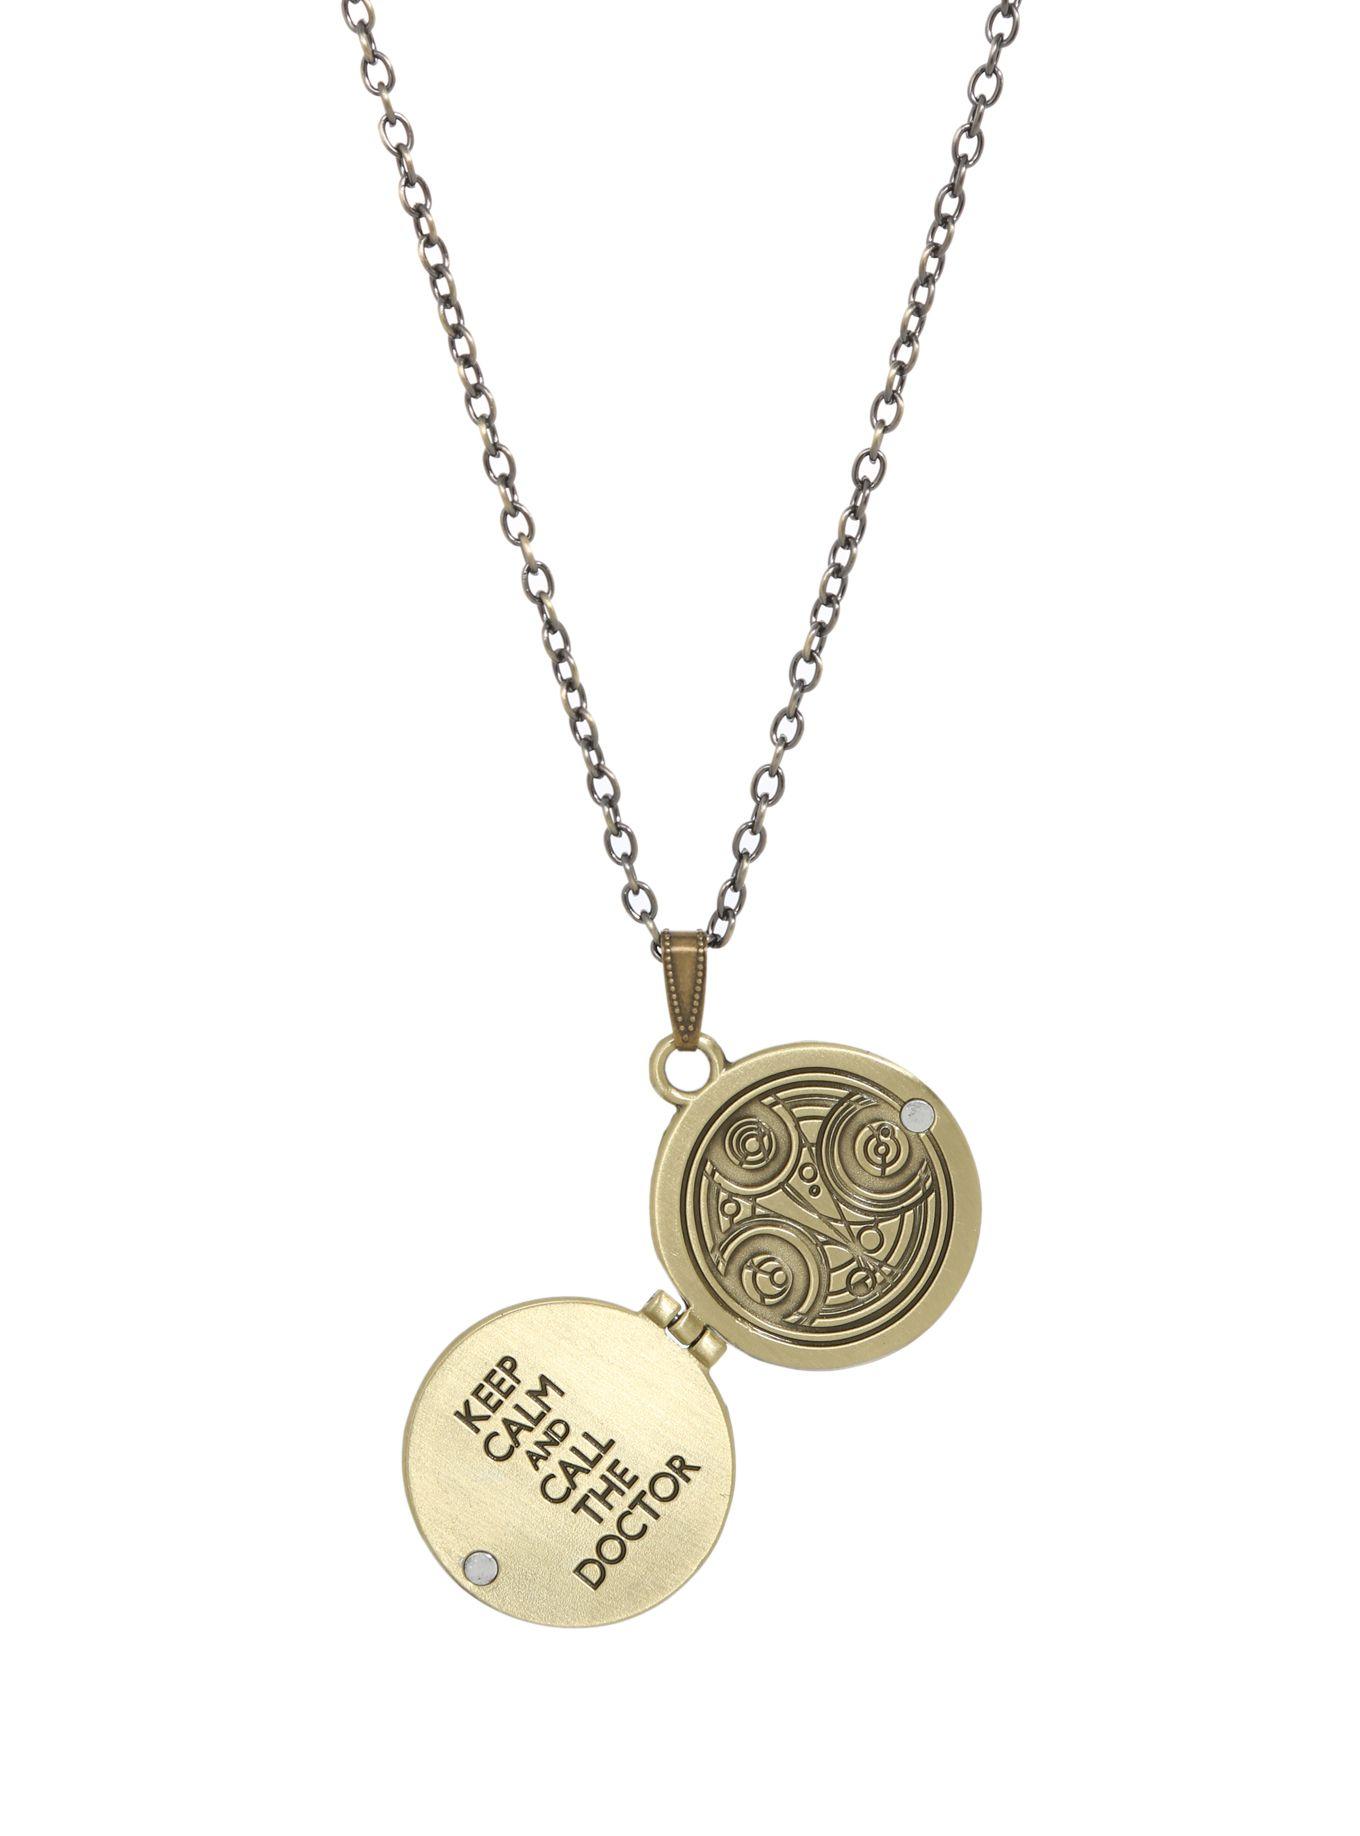 Doctor Who Gallifreyan Locket Necklace